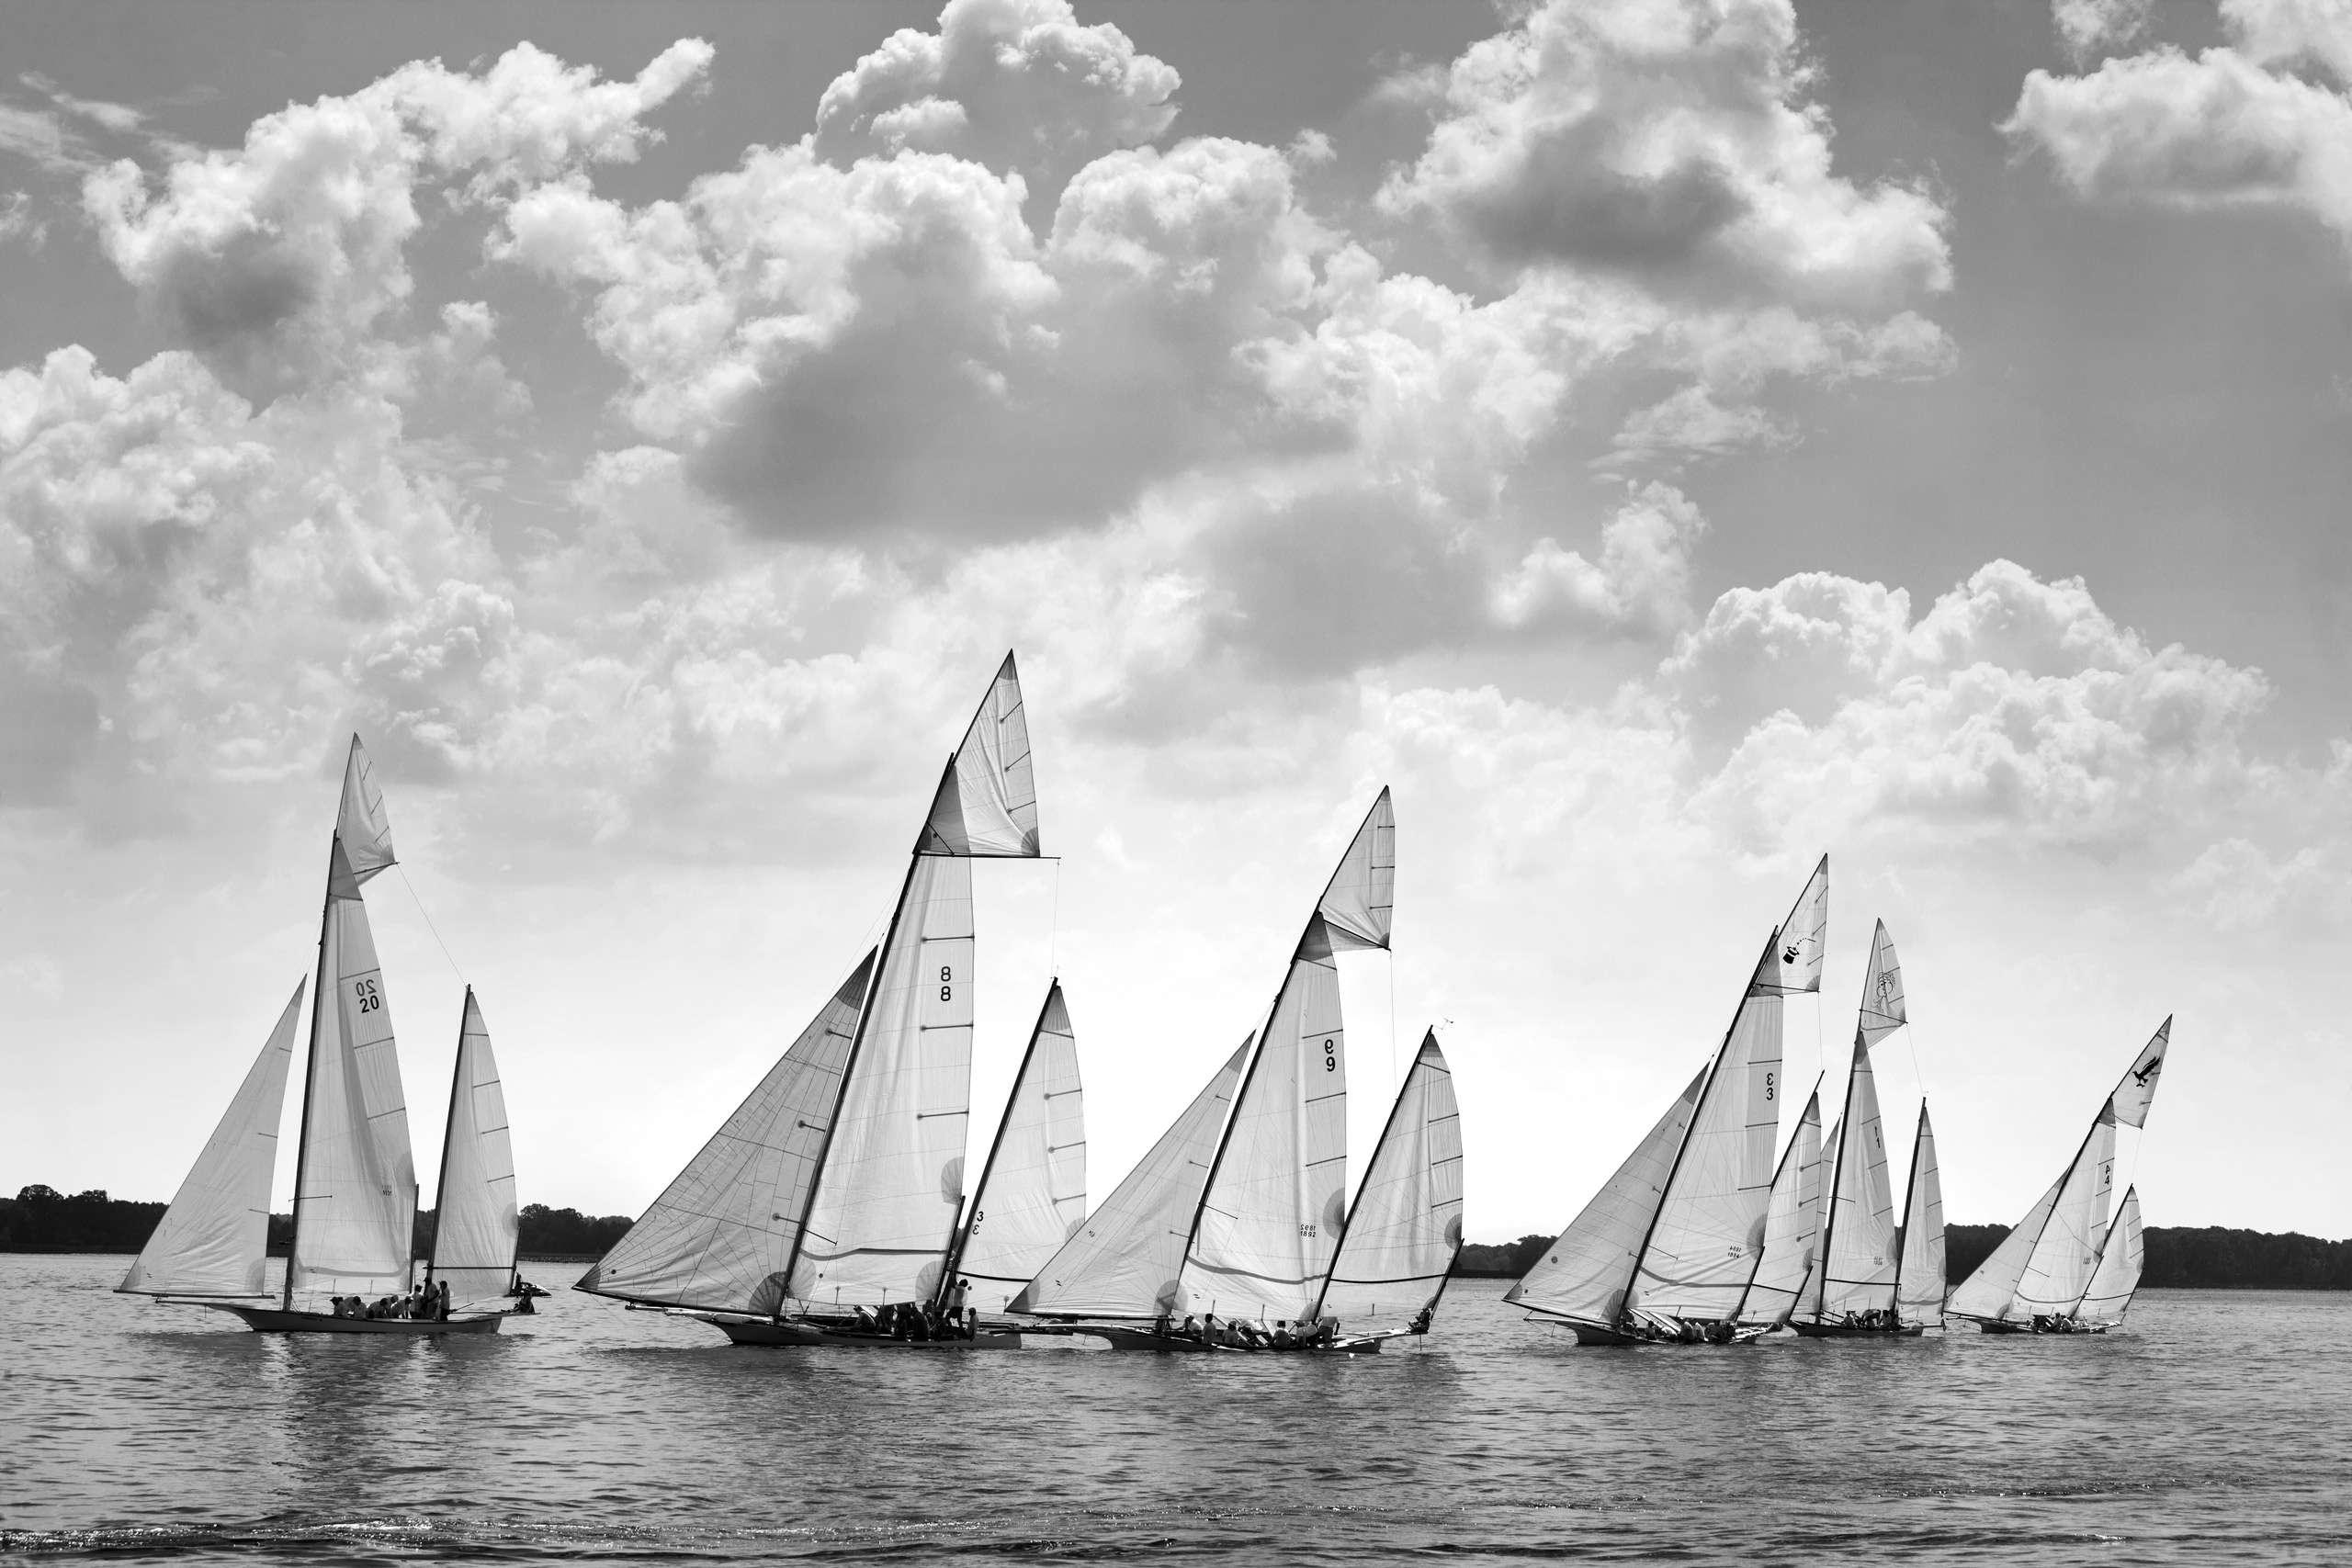 PORTFOLIO - Sailing - Log Canoes #3   PCG571